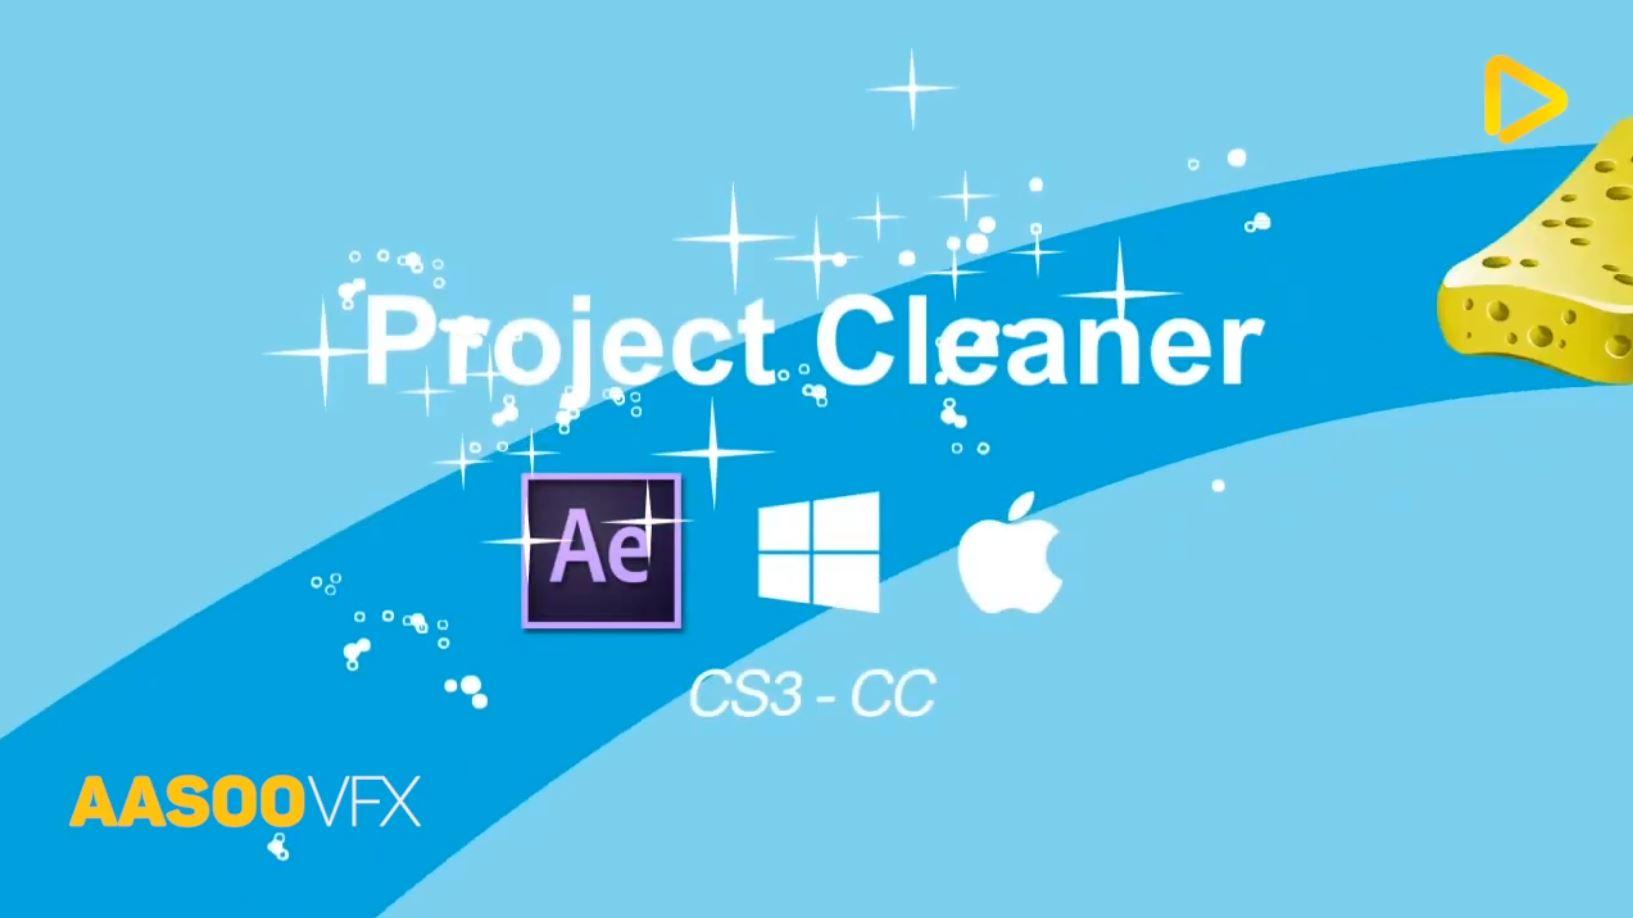 دانلود رایگان اسکریپت Project Cleaner 1.2